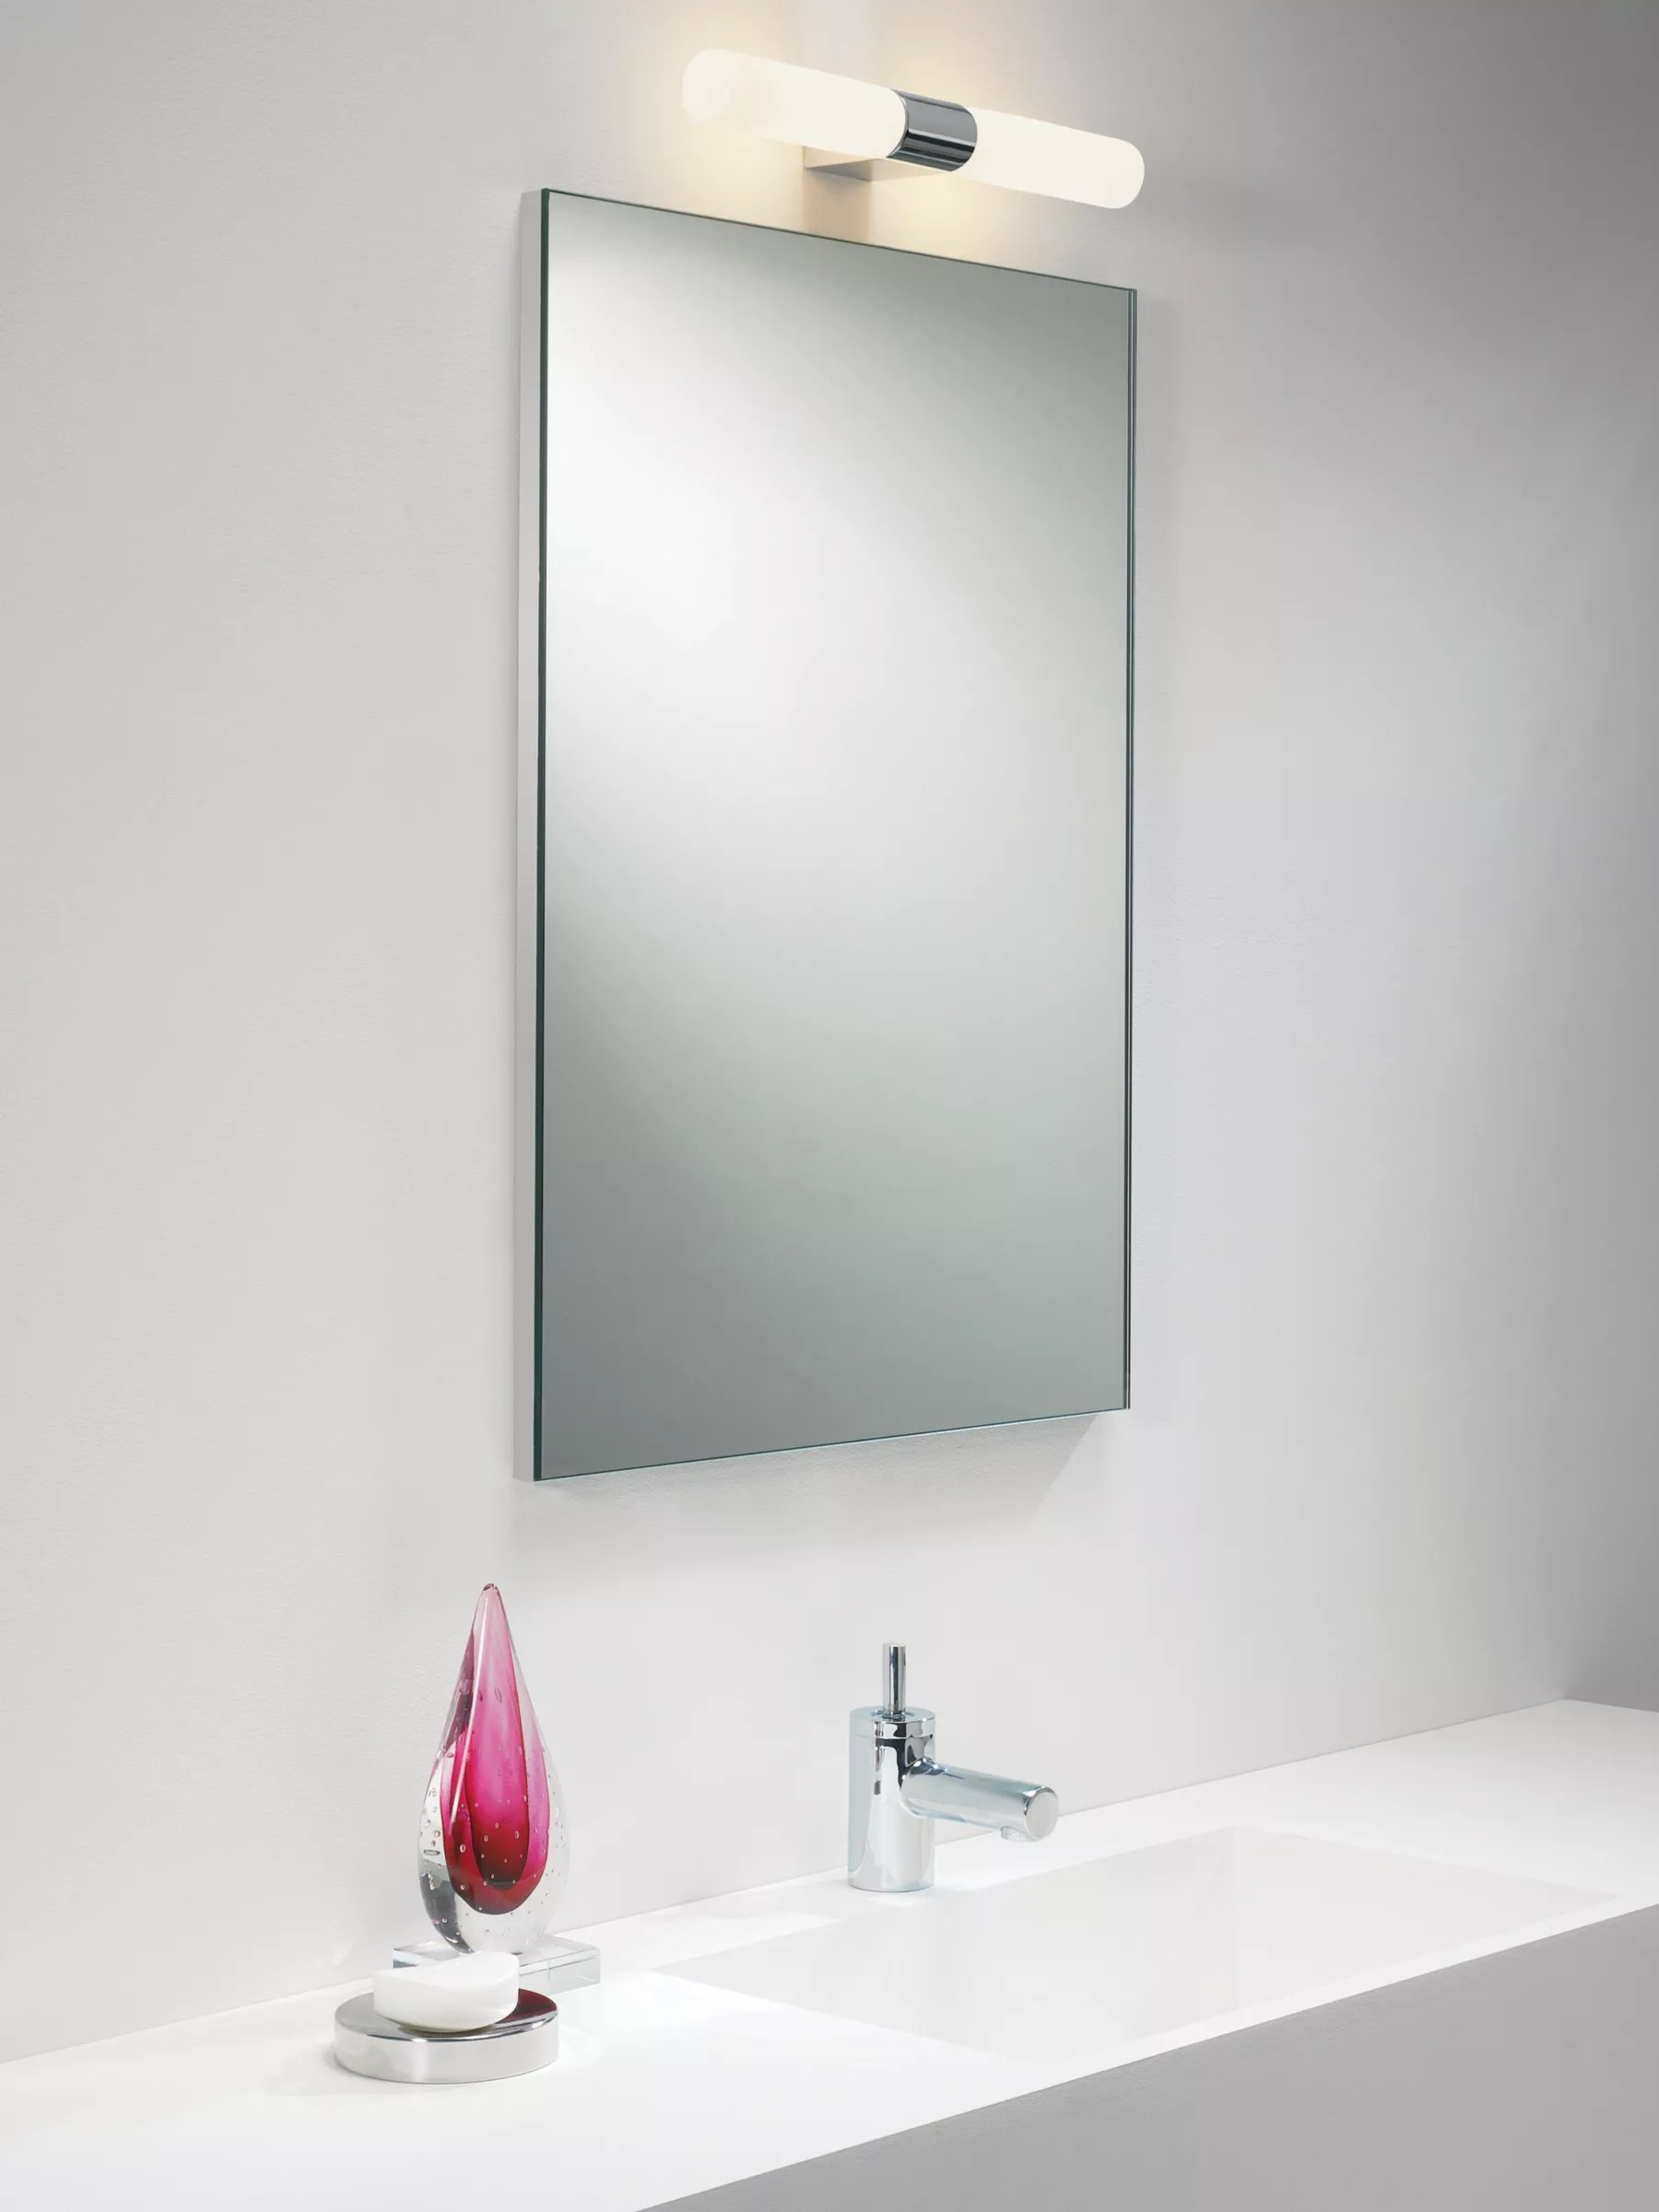 Astro Padova Over Mirror Bathroom Light at John Lewis